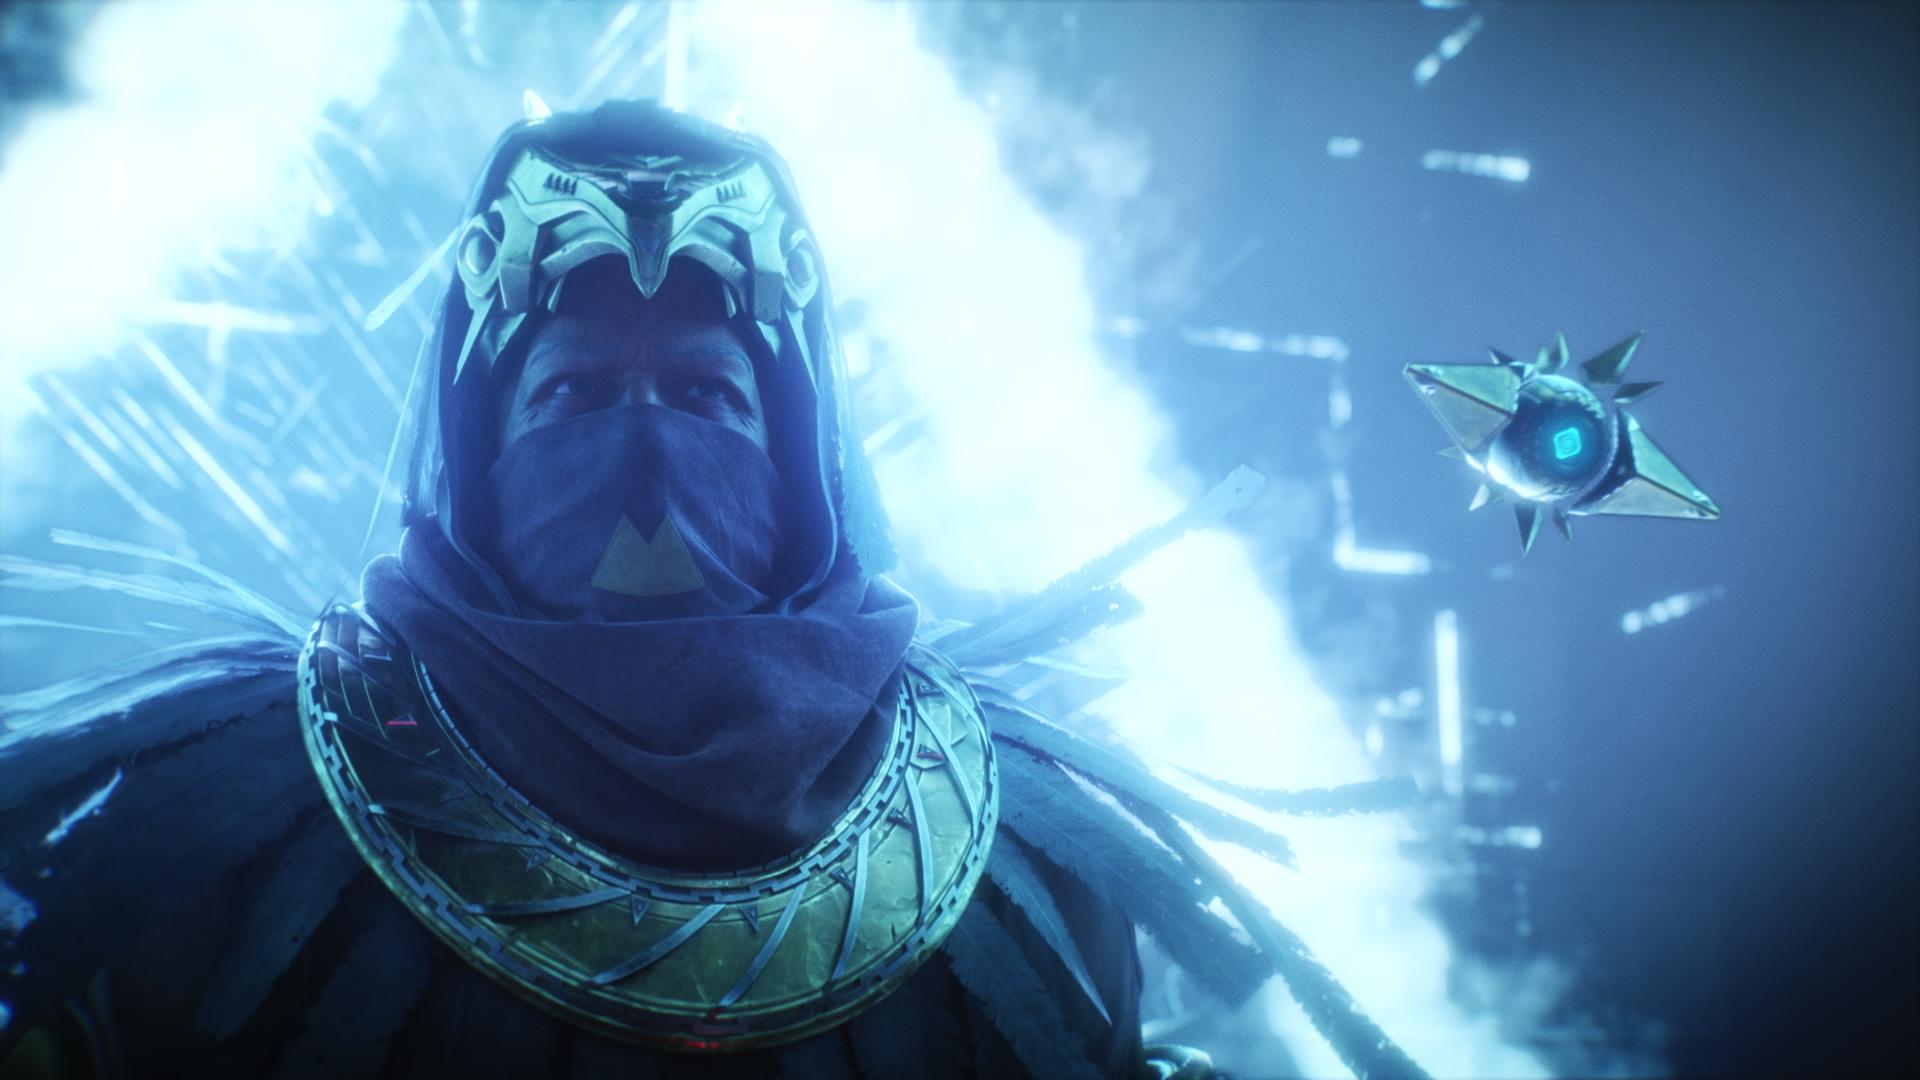 Destiny 2: Curse of Osiris. Image: Activision